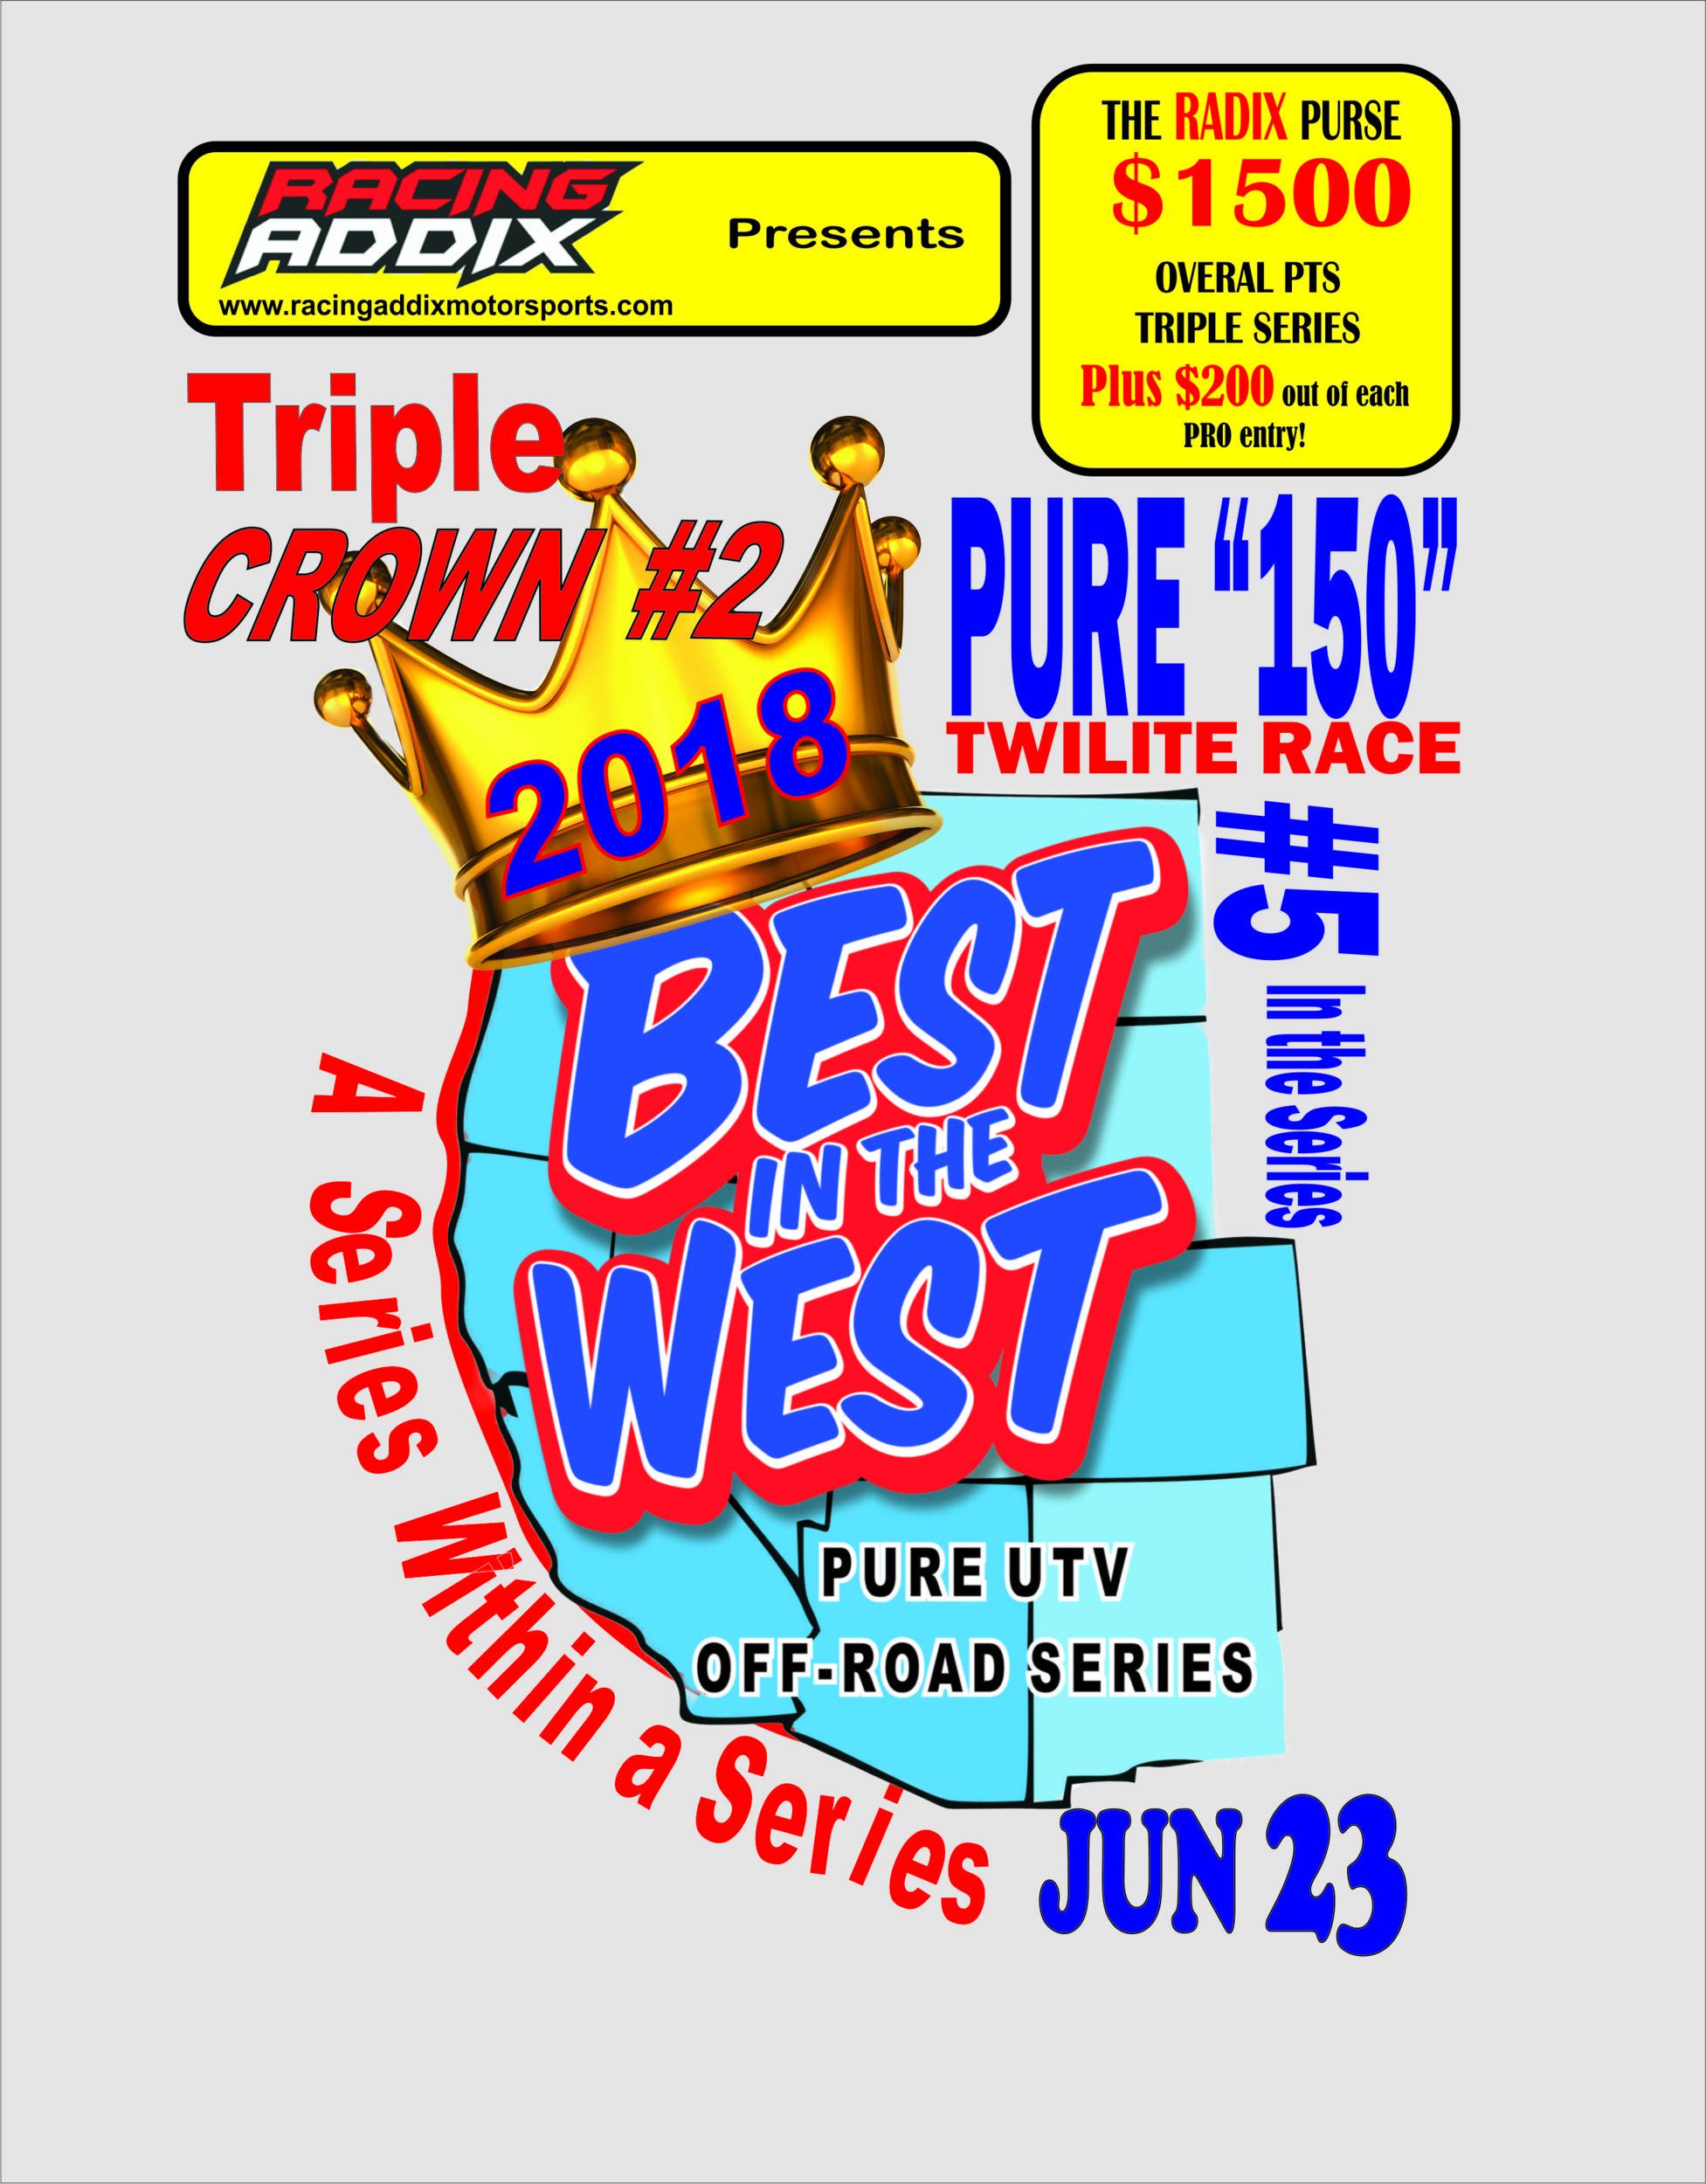 18-Jun23-Triple-#2 & #5-T-Art-REDIX-June10.jpg